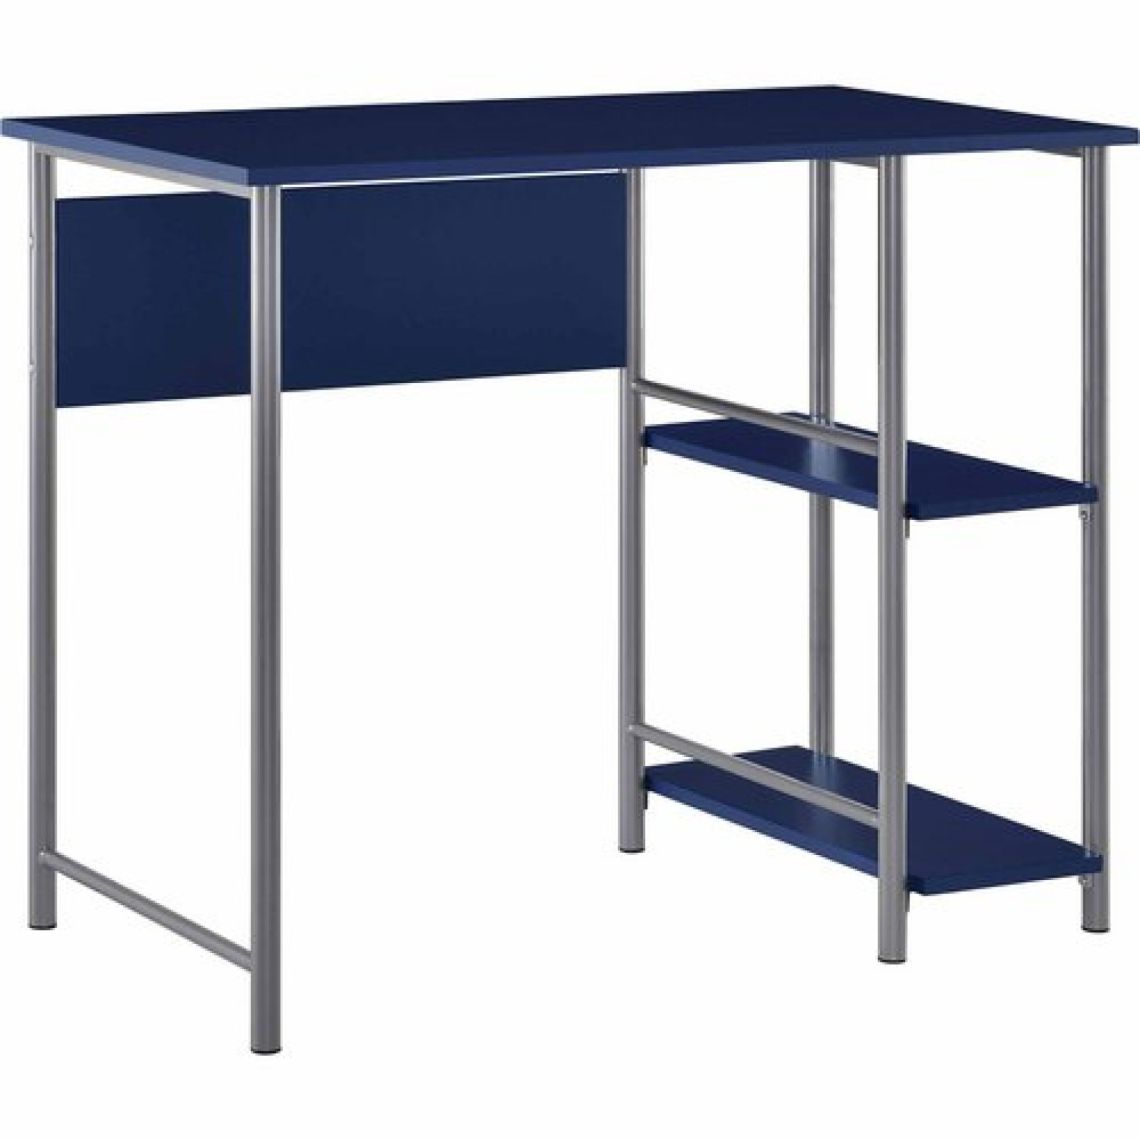 Mainstays Basic Metal Student Desk, Multiple Colors - Walmart.com